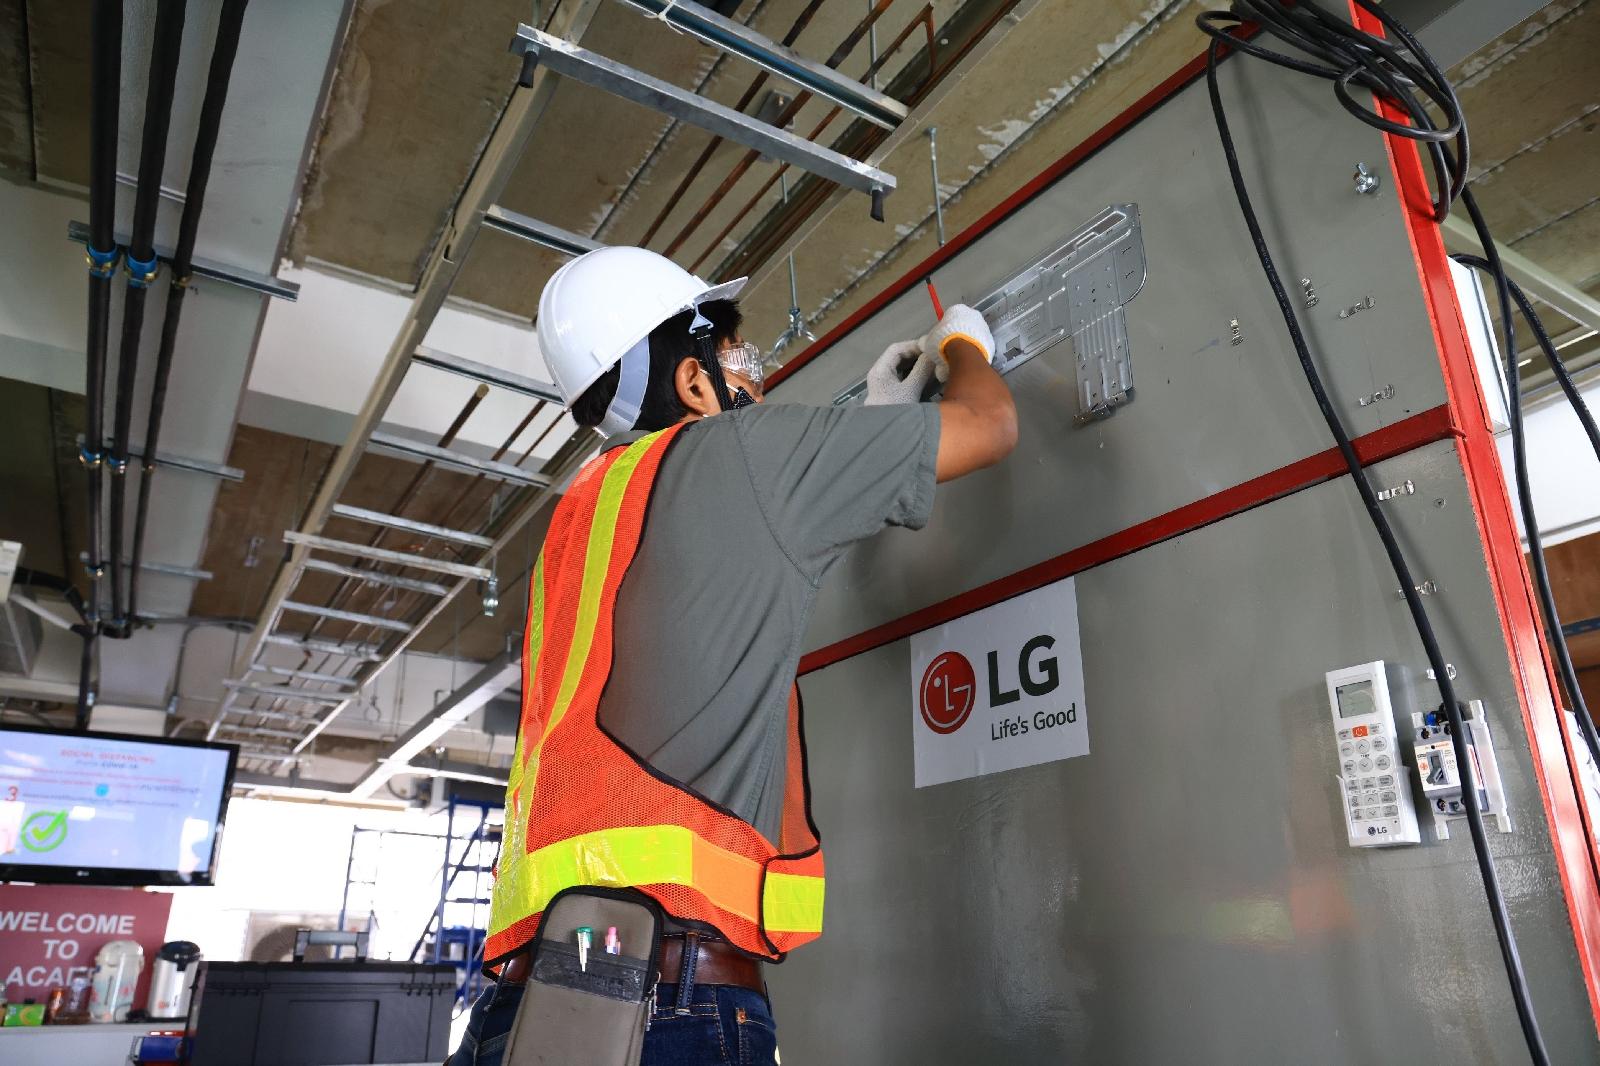 LG มุ่งฟื้นฟูอุตสาหกรรมเครื่องปรับอากาศไทย จัดตั้งศูนย์ทดสอบมาตรฐานฝีมือแรงงาน ผลักดันศักยภาพช่างติดตั้งระดับสากล